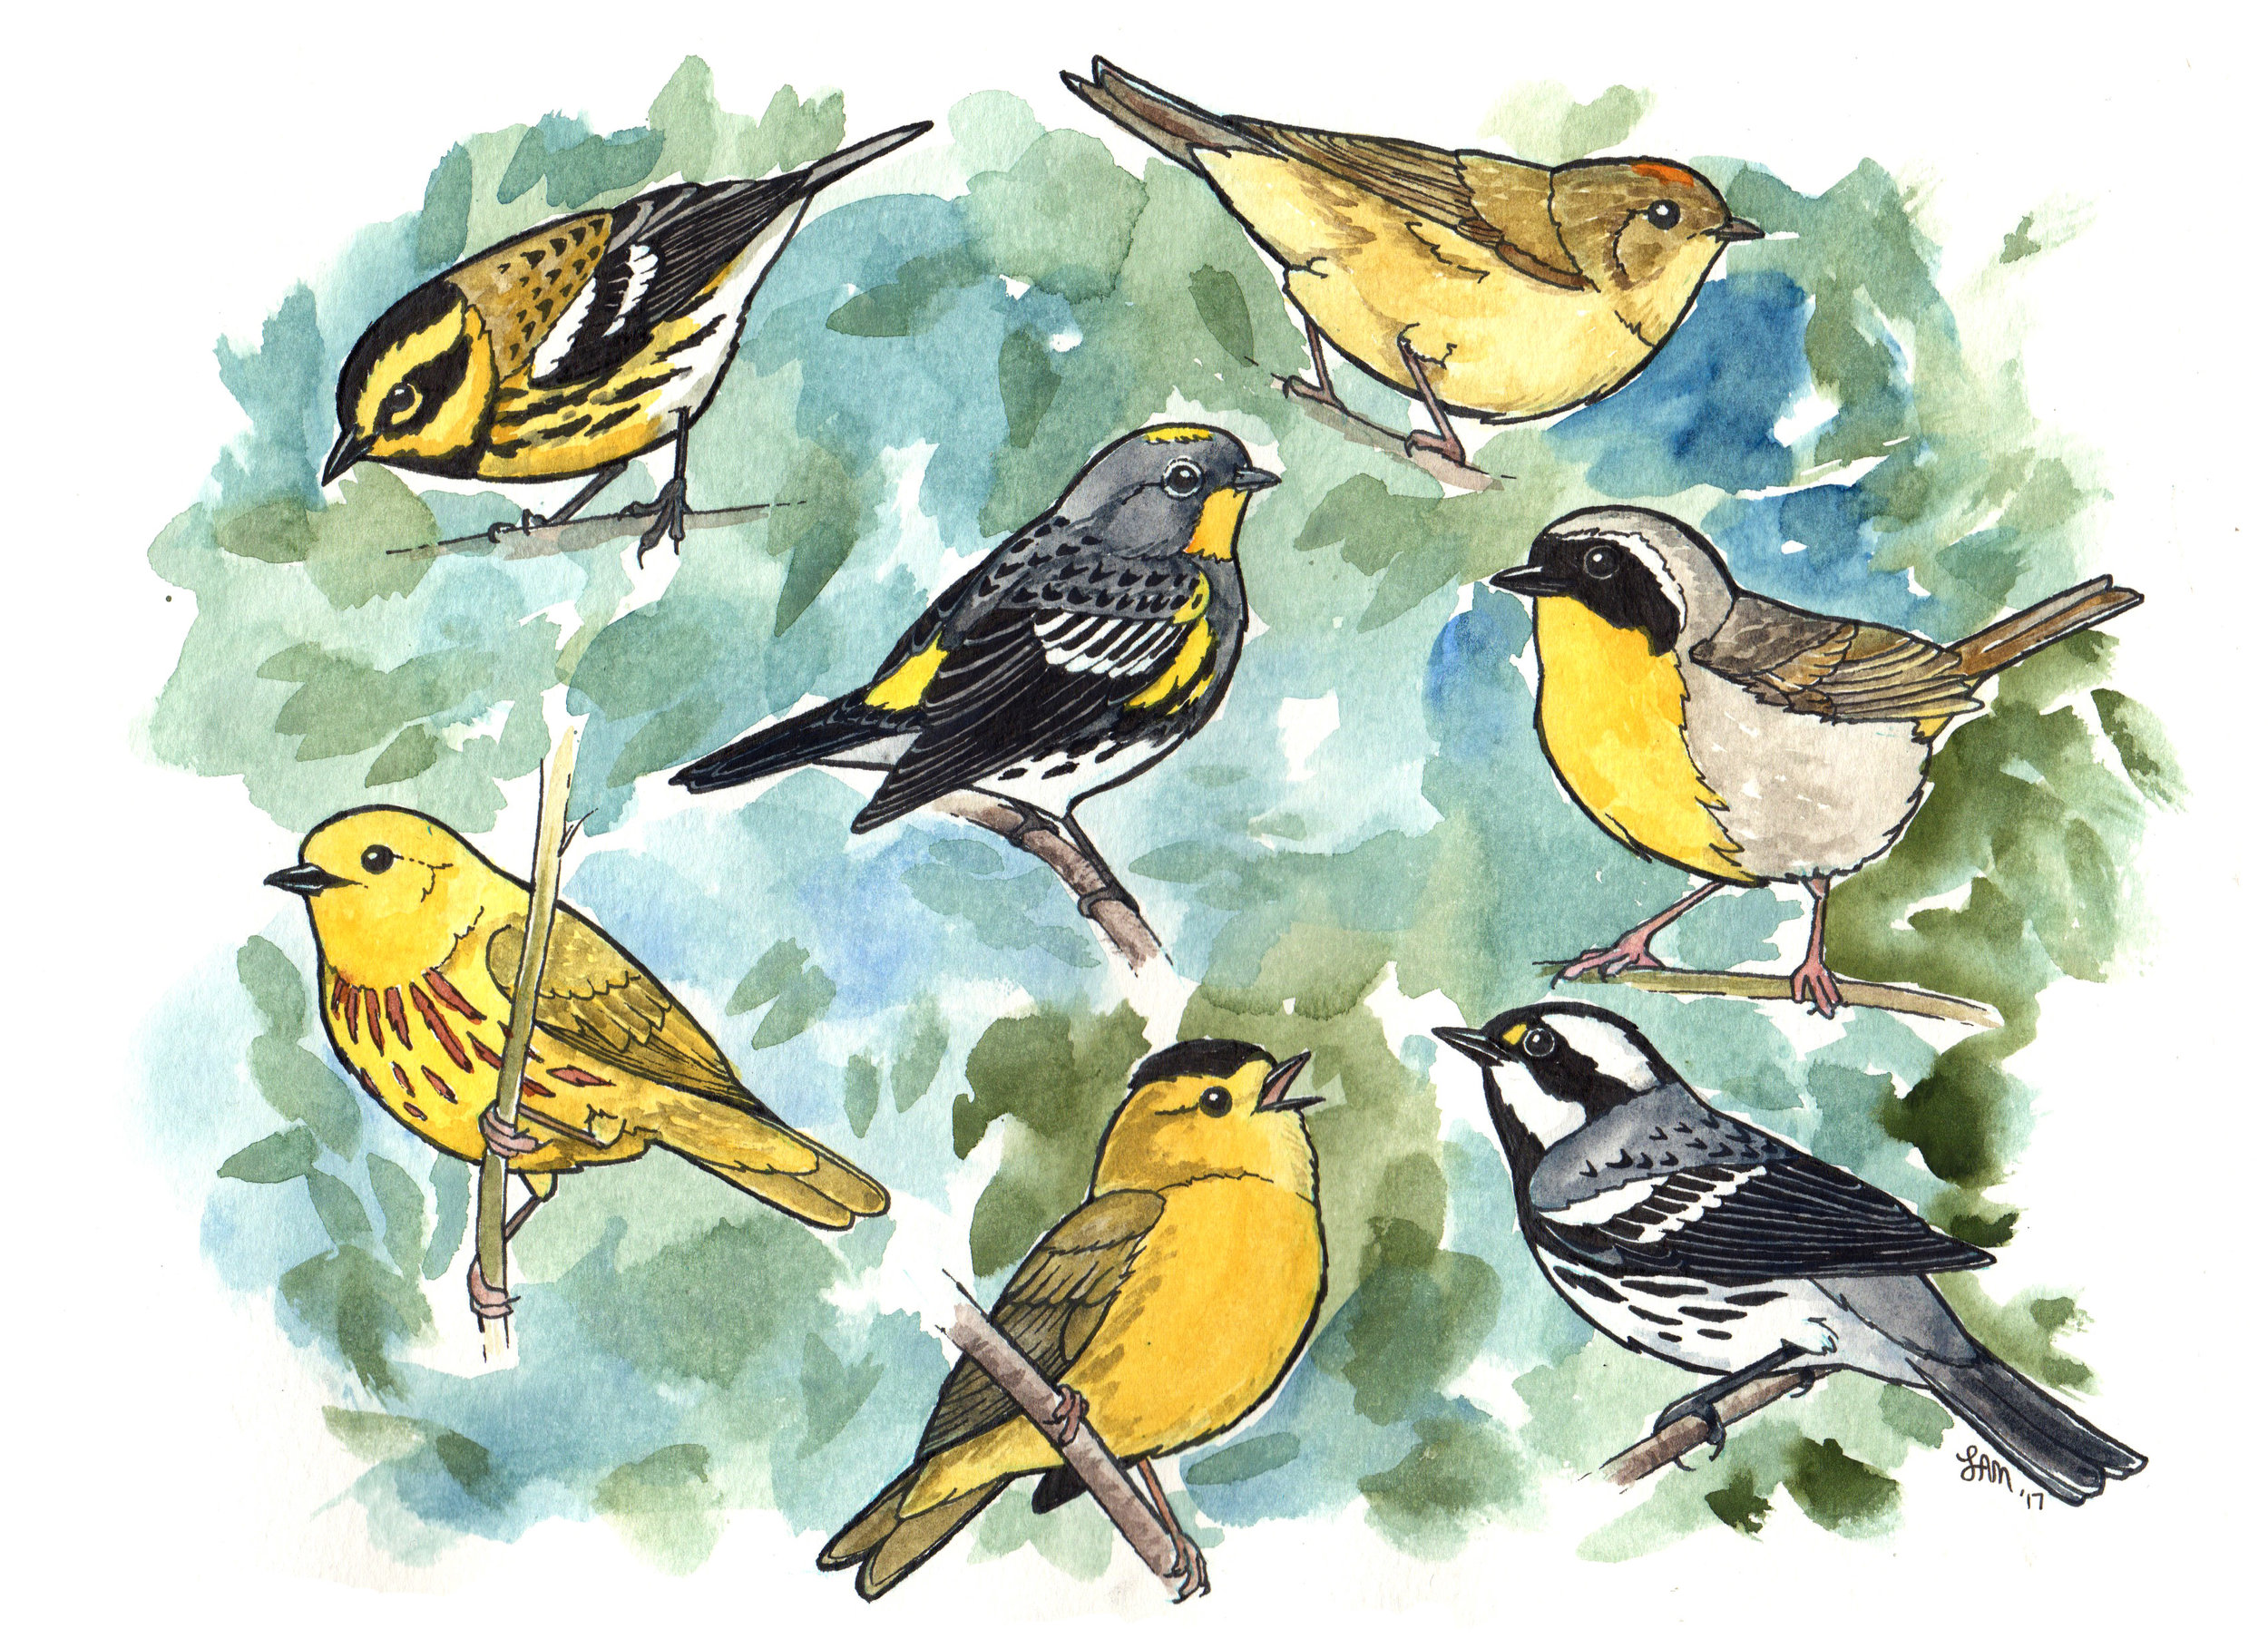 Warbler species of Washington State. Artwork by Laurel Mundy.